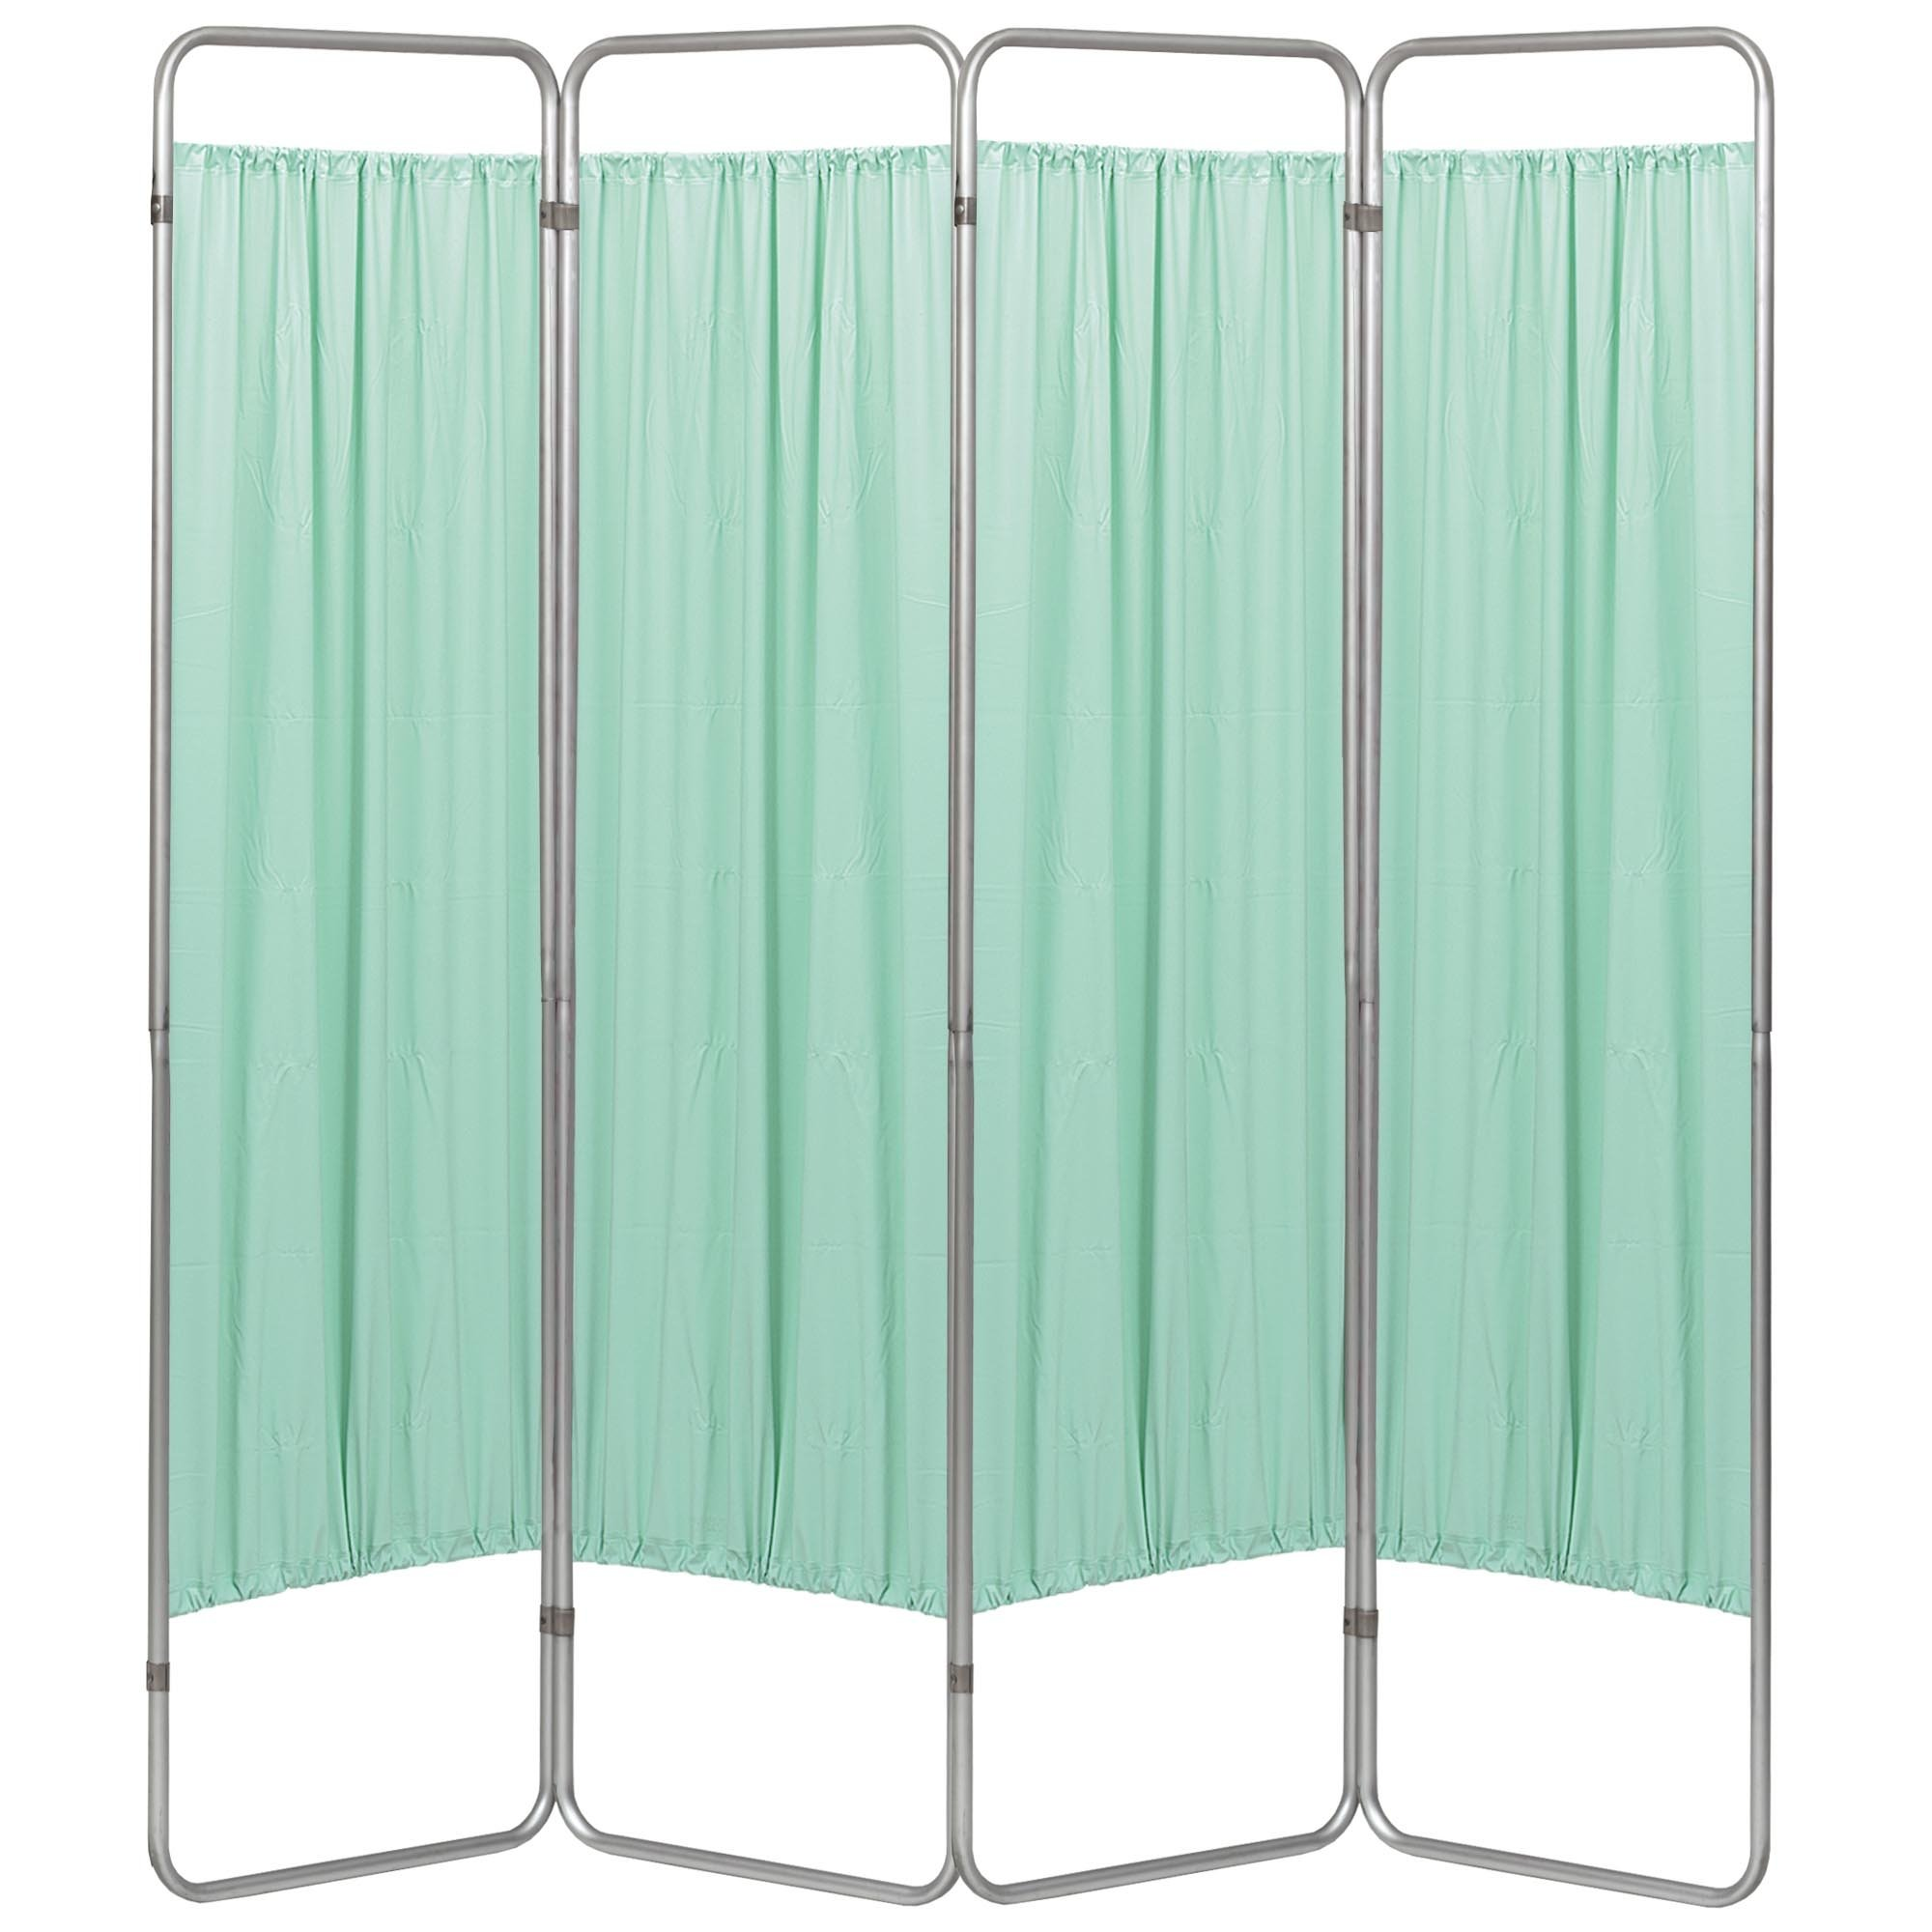 Economy 4 Section Folding Privacy Screen - Green Vinyl Screen Panel